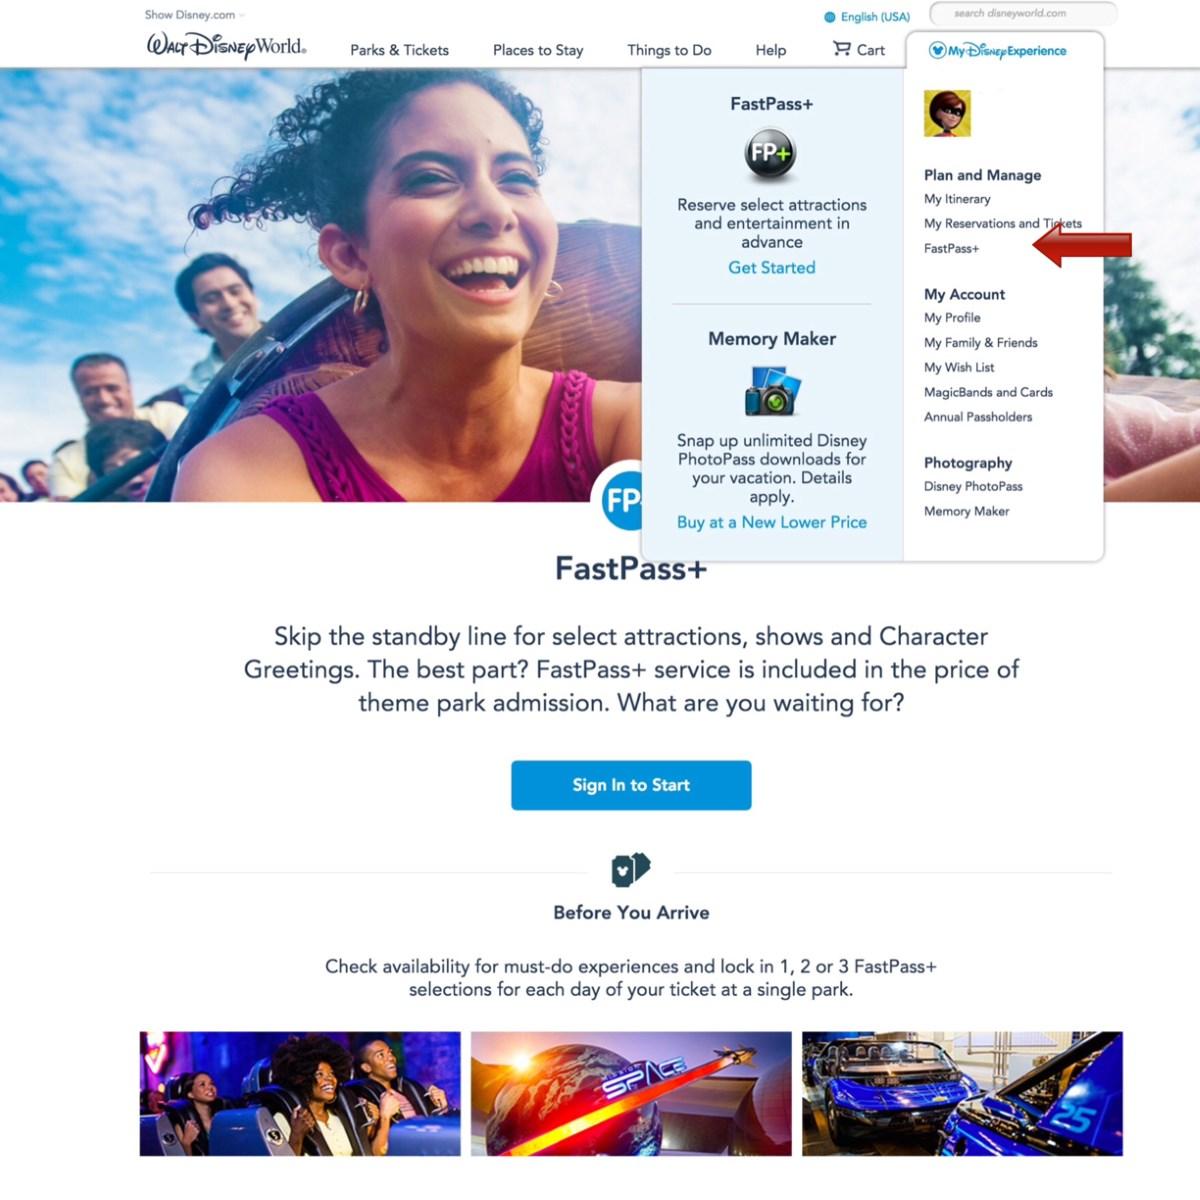 Making FastPass+ Reservations | Walt Disney World